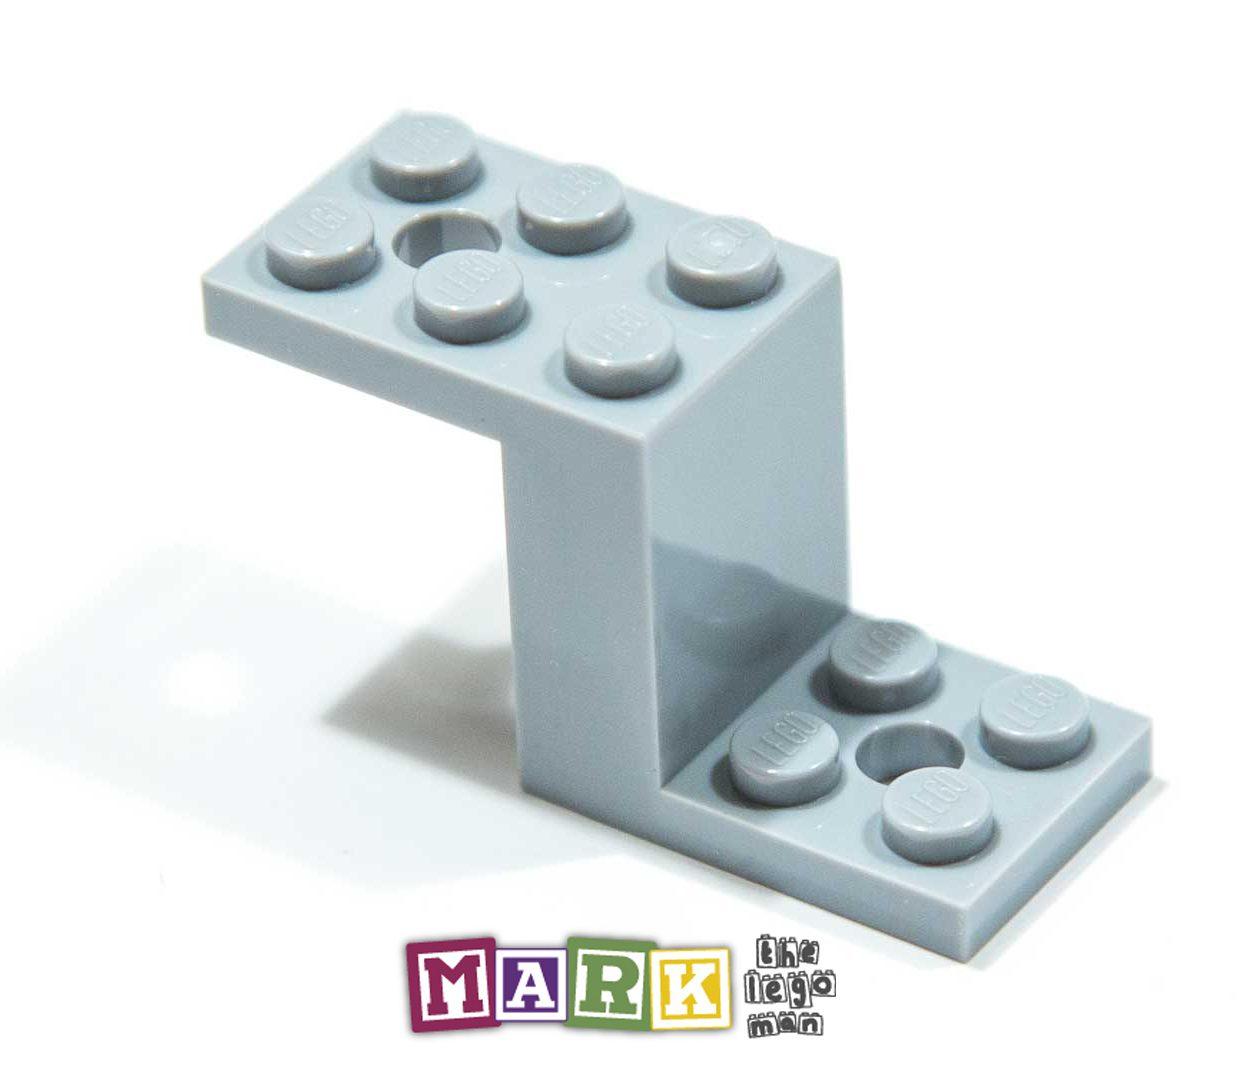 New Lego 76766 2x5x2,1/3 Bottom Brick and plates 6012653